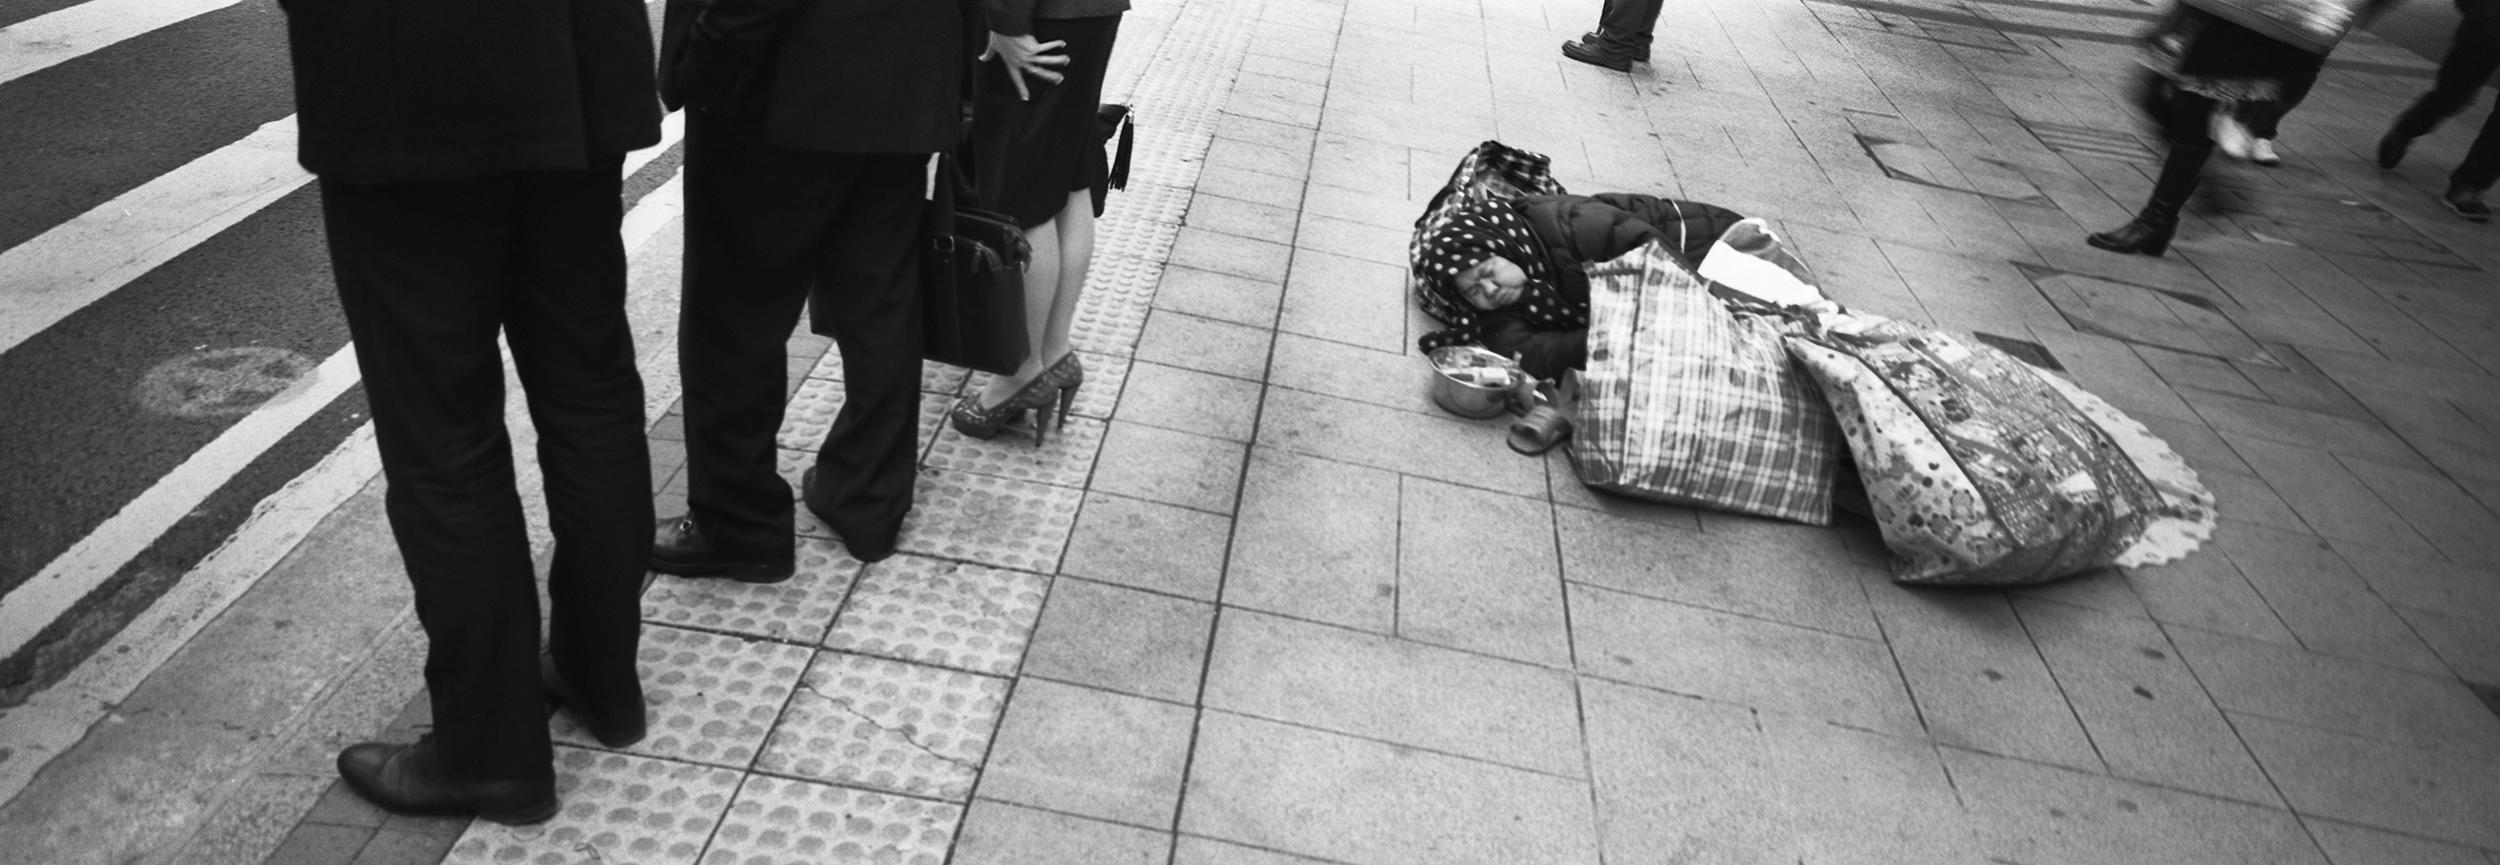 Business people and beggar. Hong Kong. 2014